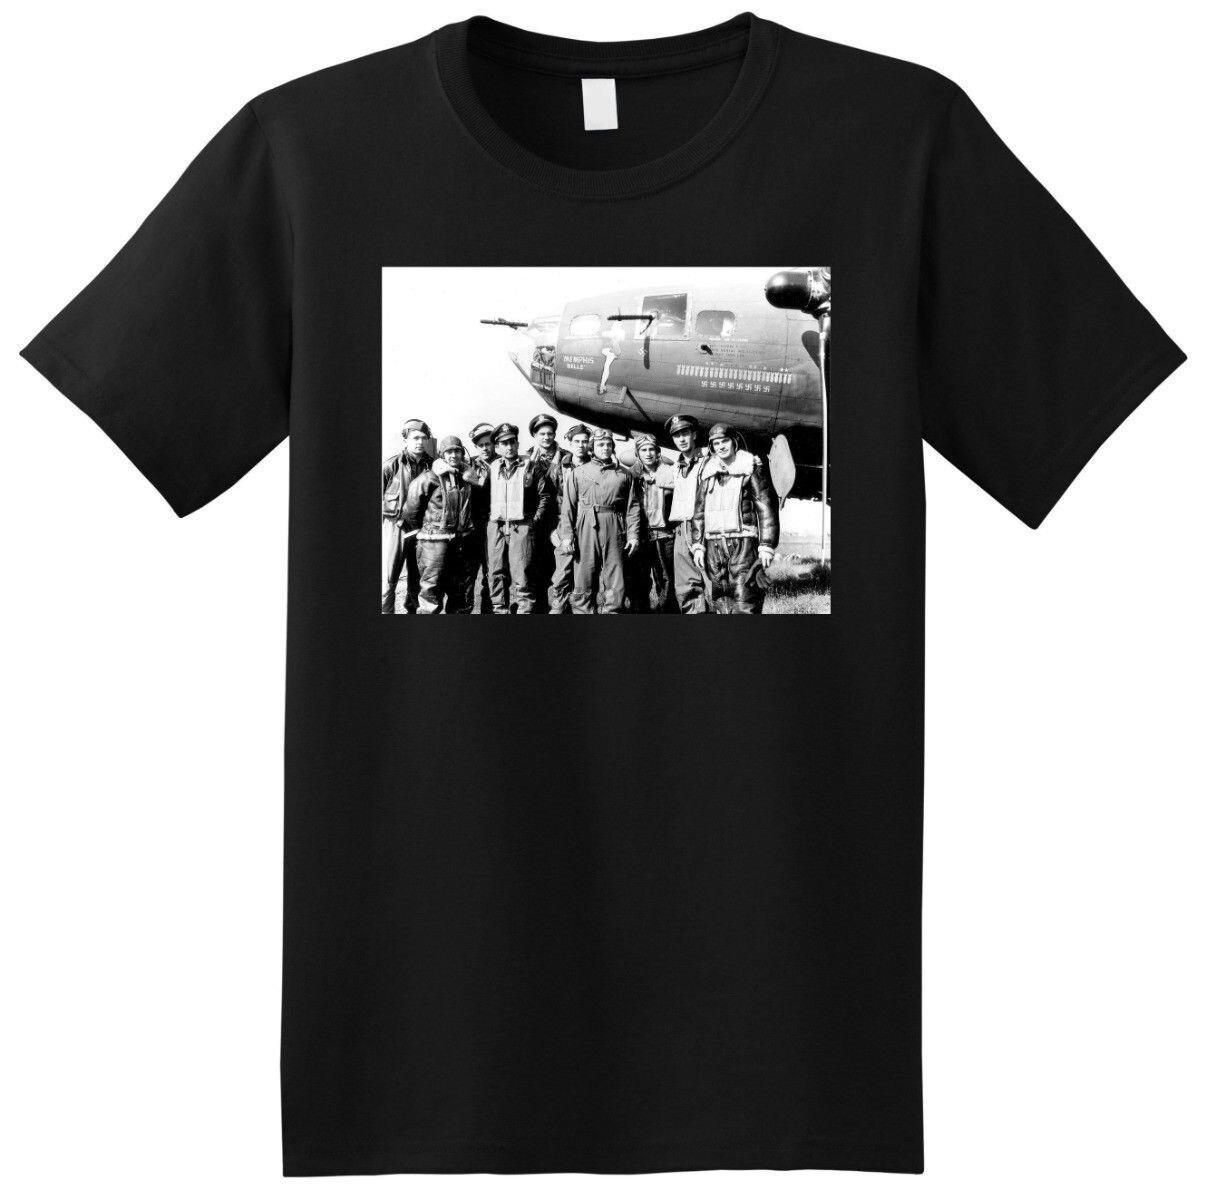 MEMPHIS BELLE b-17 bomber weltkrieg 2 ii foto t KLEINE MEDIUM LARGE oder XL Herren T Shirt Sommer O neck 100% Baumwolle Männer Kurze